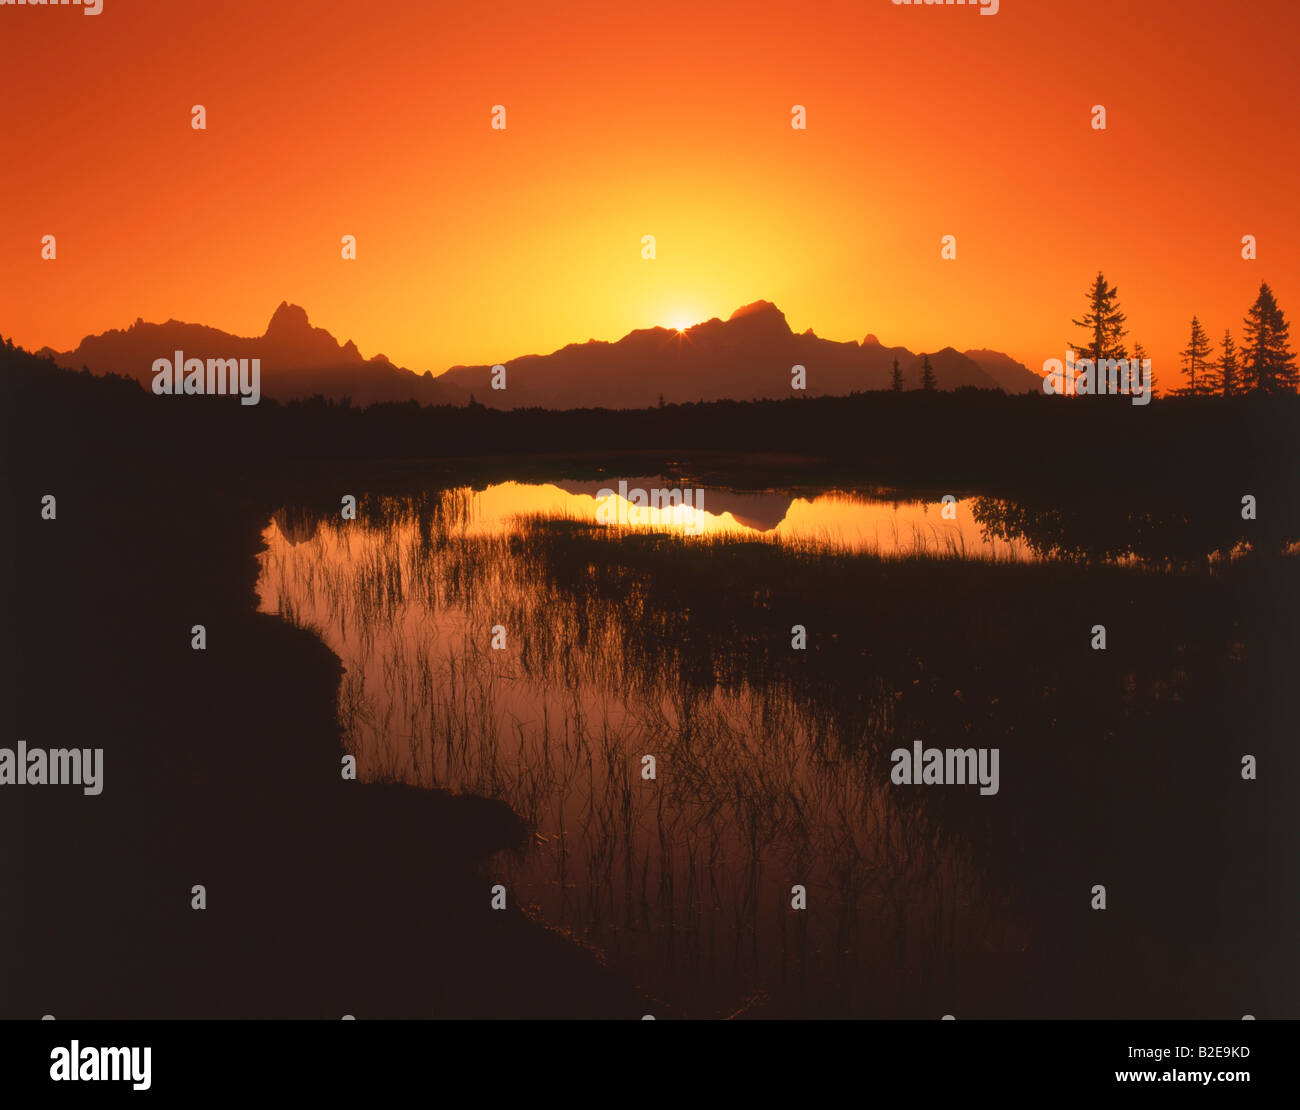 Sunset over mountain, Dachsteingruppe, Gosaukamm, Pongau, Salzburg, Austria Stock Photo